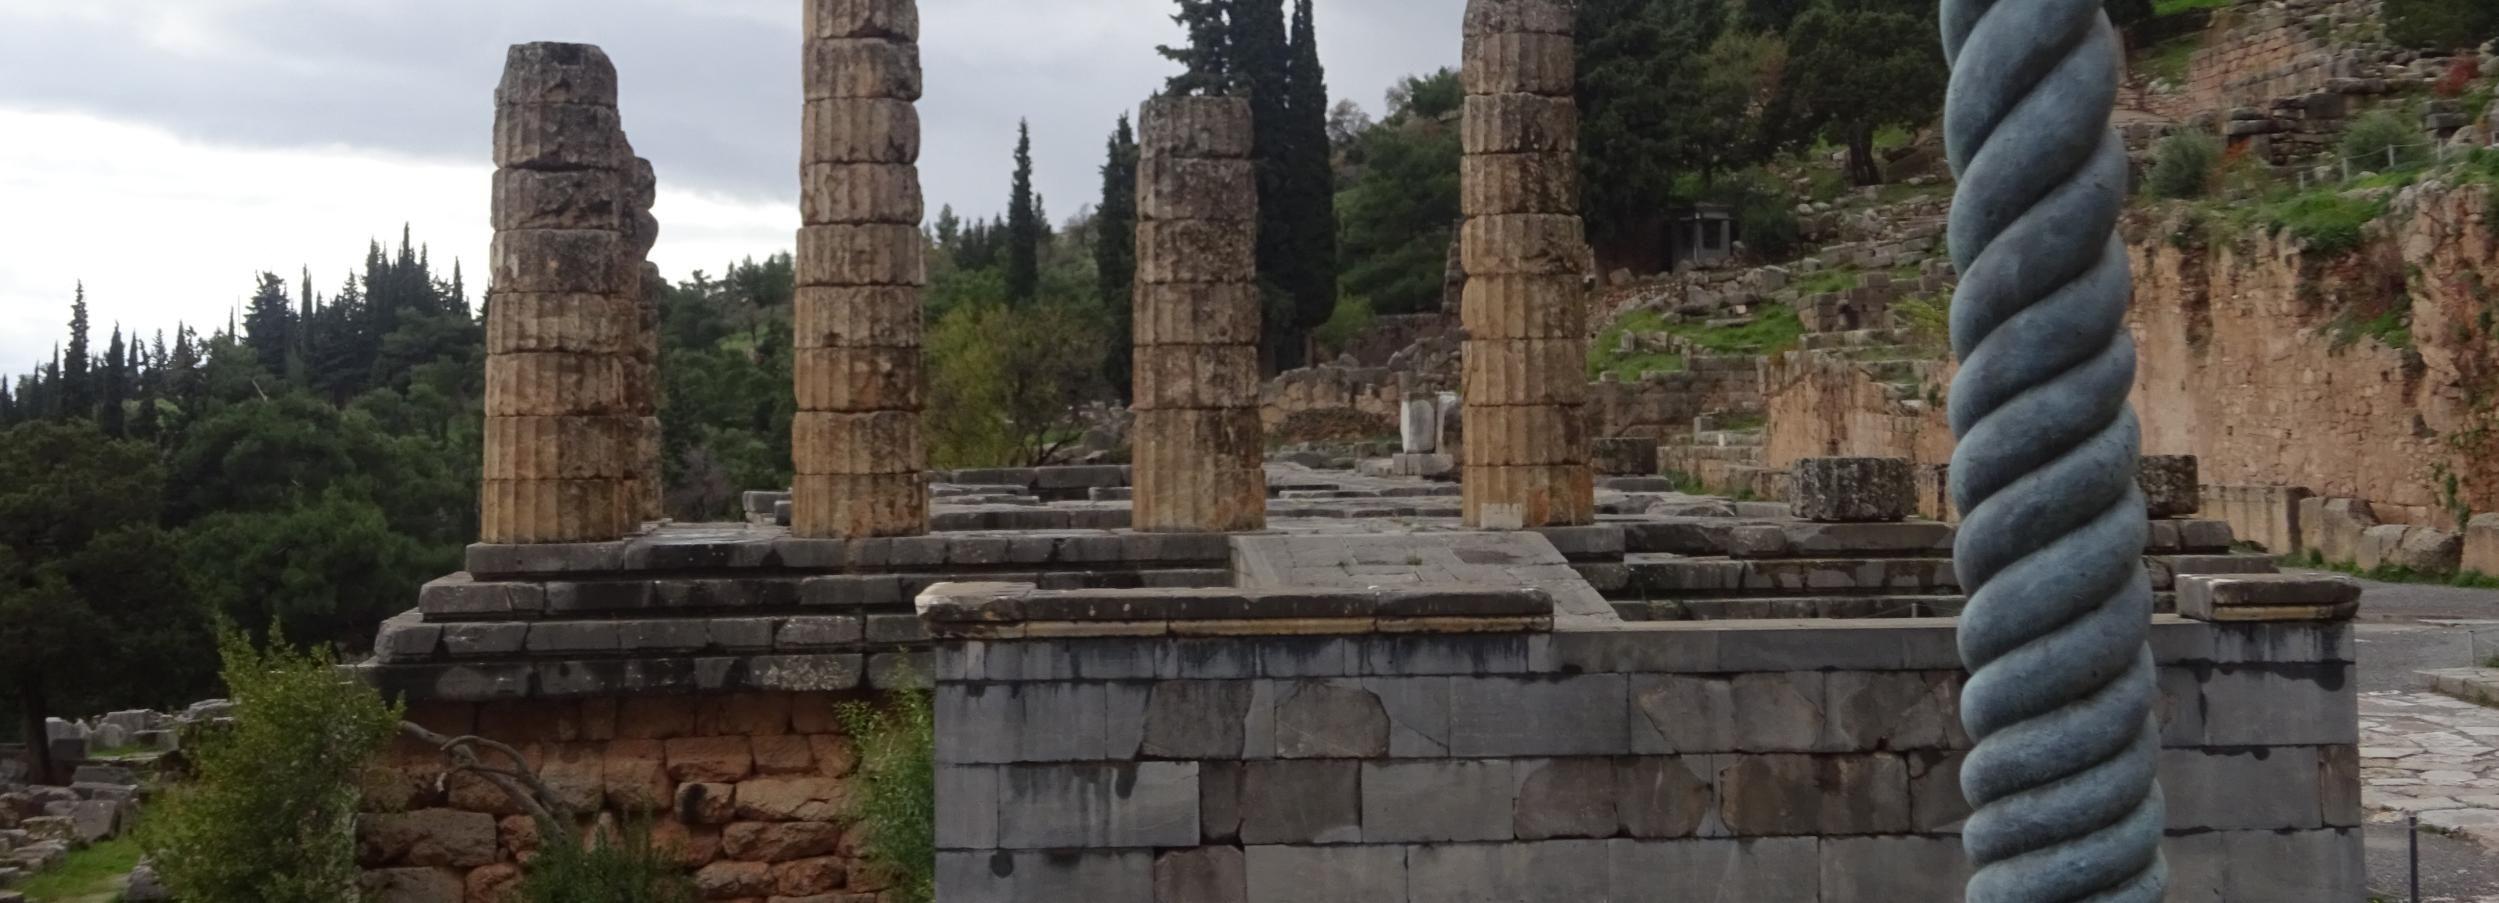 Desde Atenas: tour de 2 días a Delfos con hotel 4 estrellas